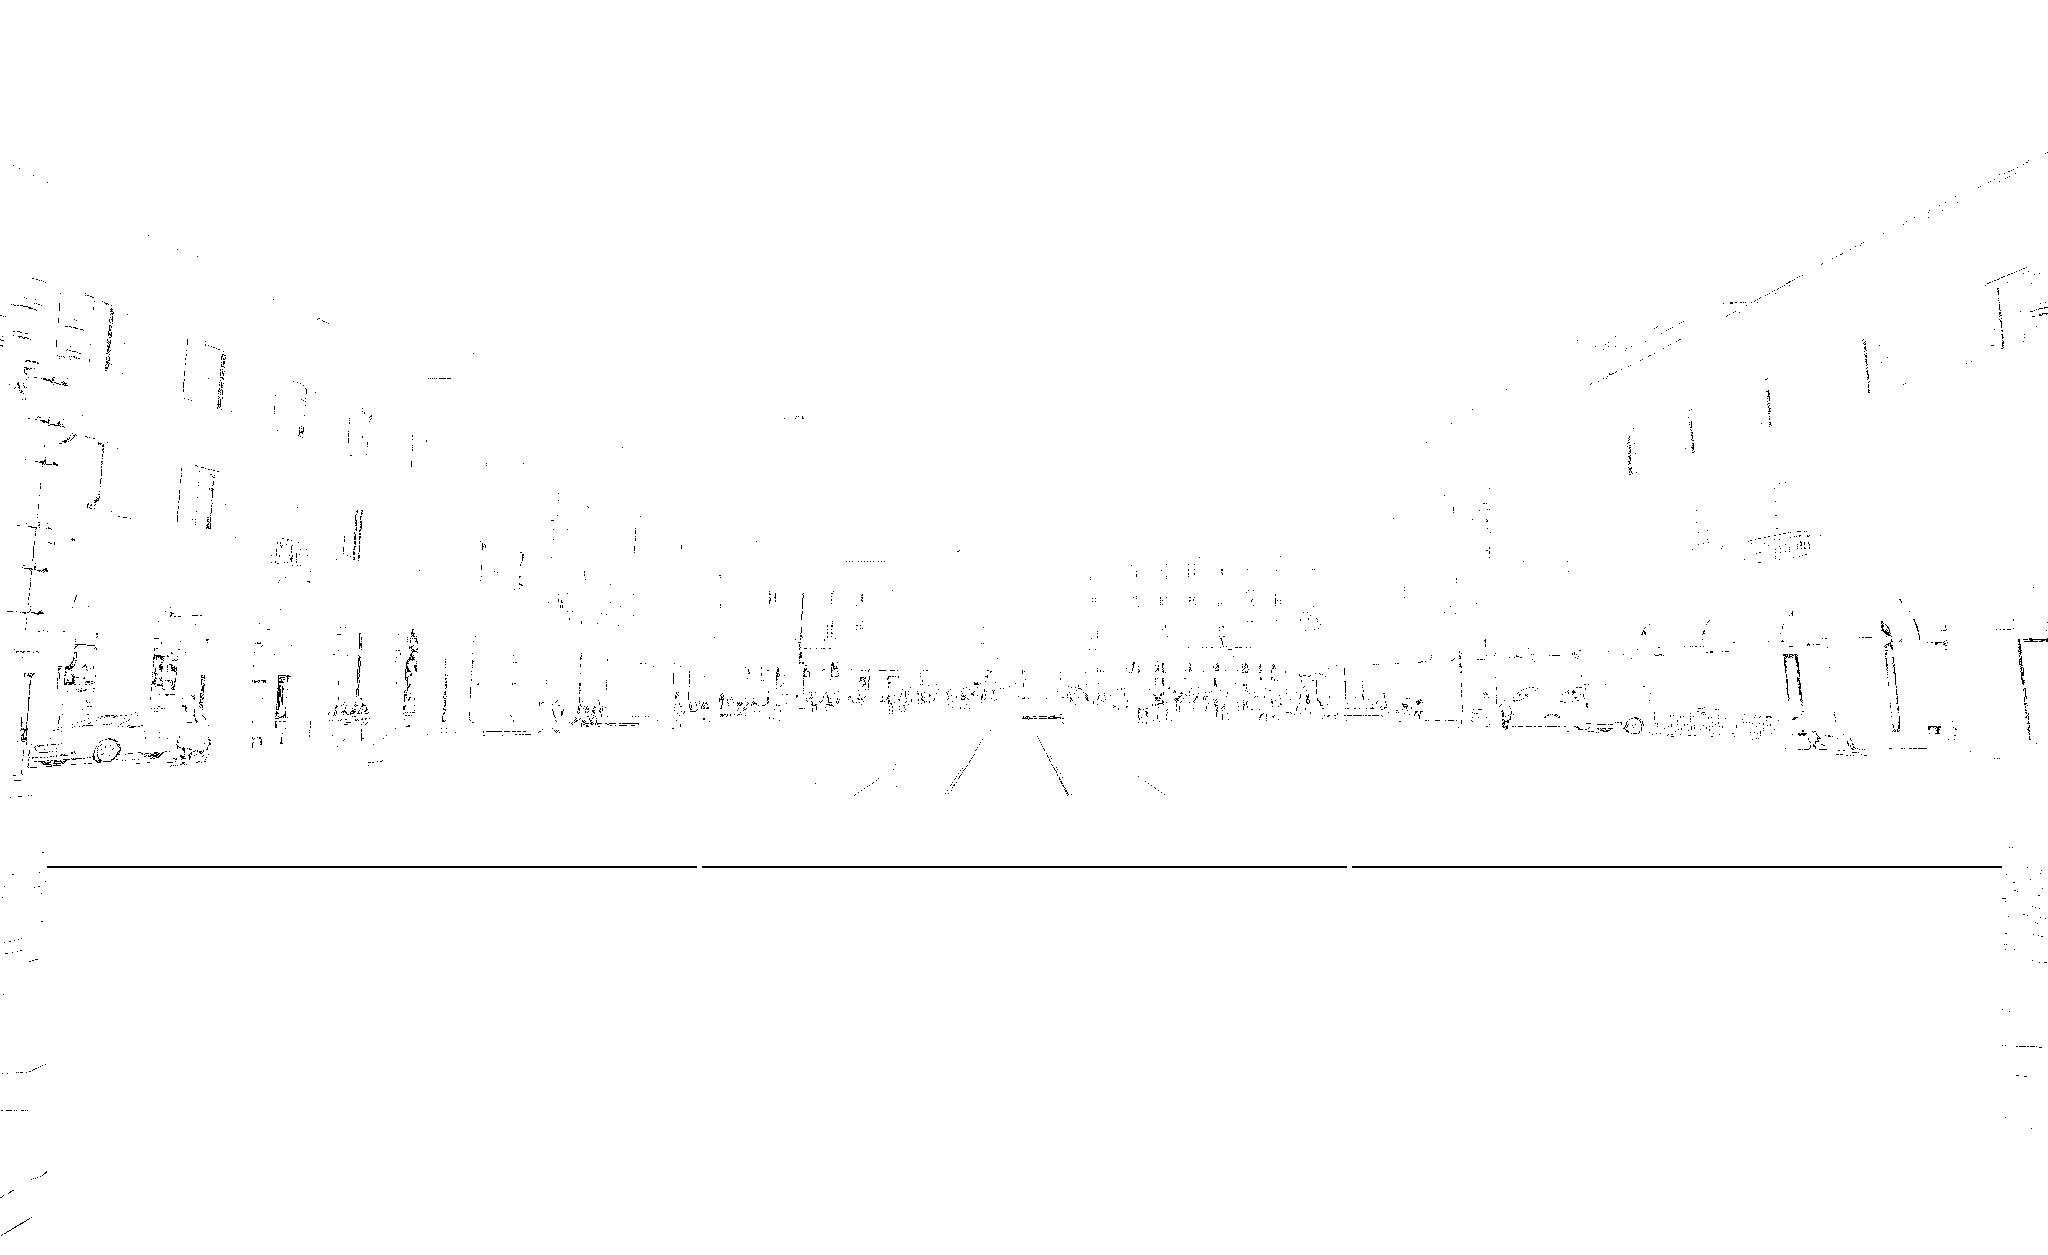 Météo Nice: Prévisions du mercredi 21 avril 2021